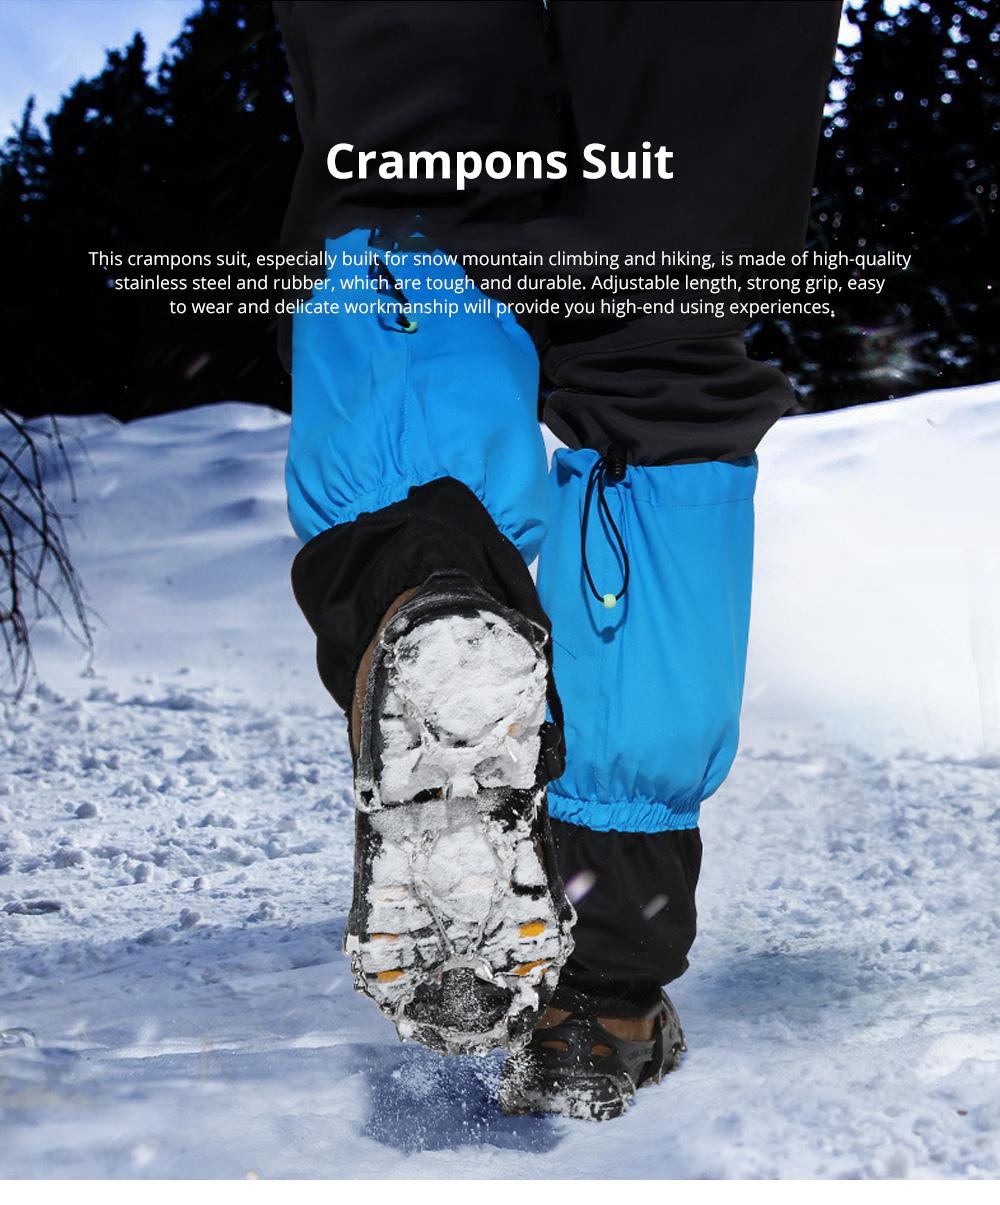 Professional Mountain Climbing Ice Surface Walking Hiking Adjustable Crampons Suit with Storage Bag 0